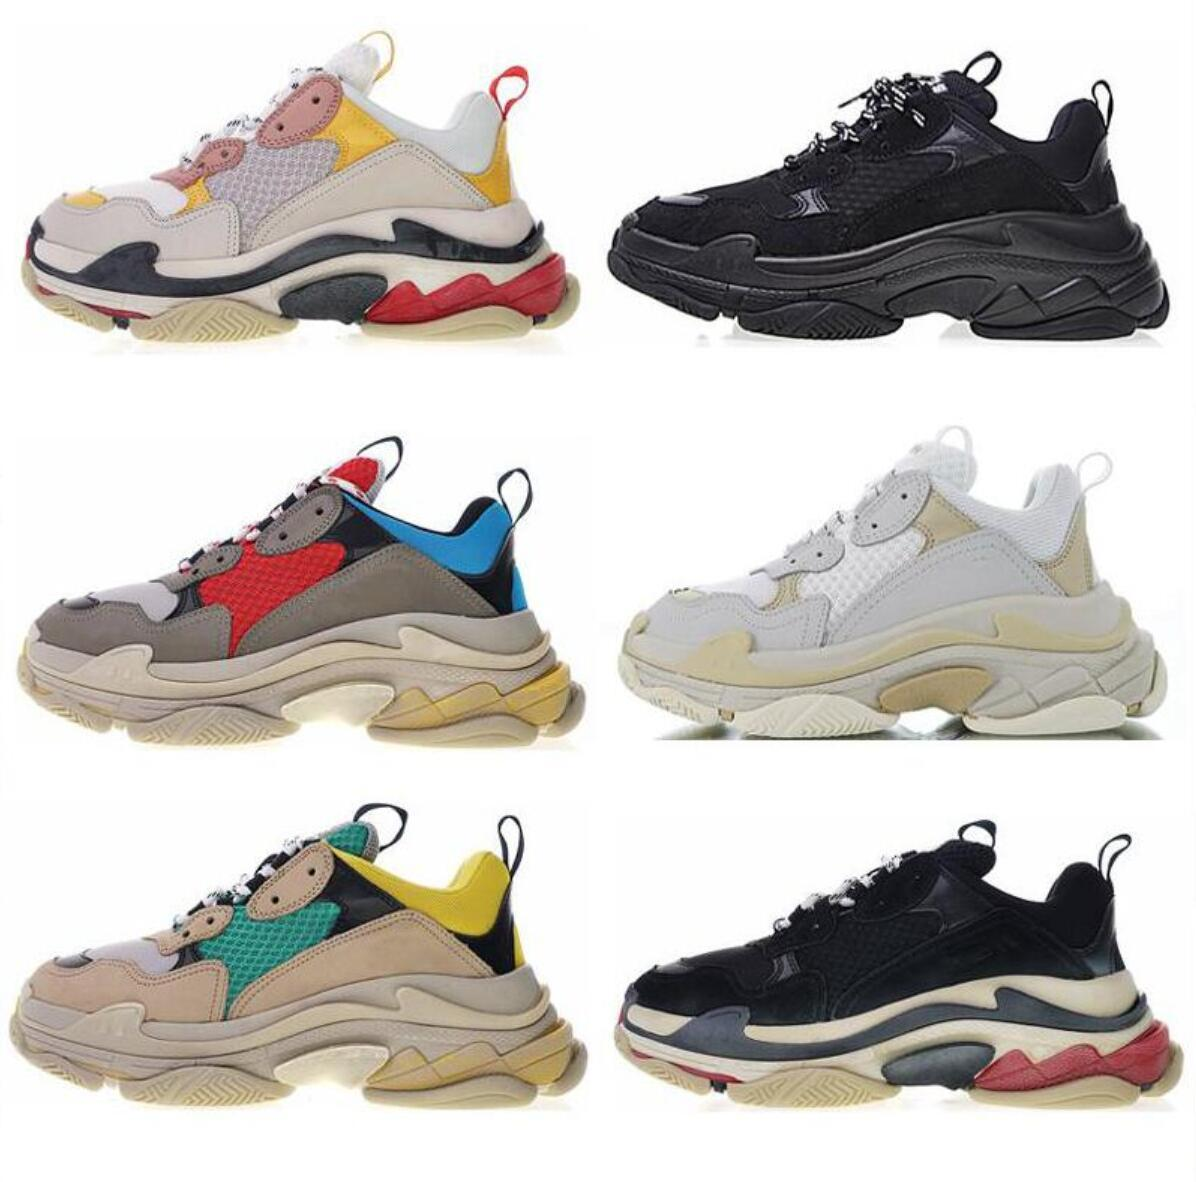 huge selection of 9de3d 9acac 2019 Size 36-45 Sale Hot!!2019 Fashion geox Triple s Men Women Low Lace up  Casual Sport Shoes Outdoor Unisex Zapatillas Sneakers,36-45